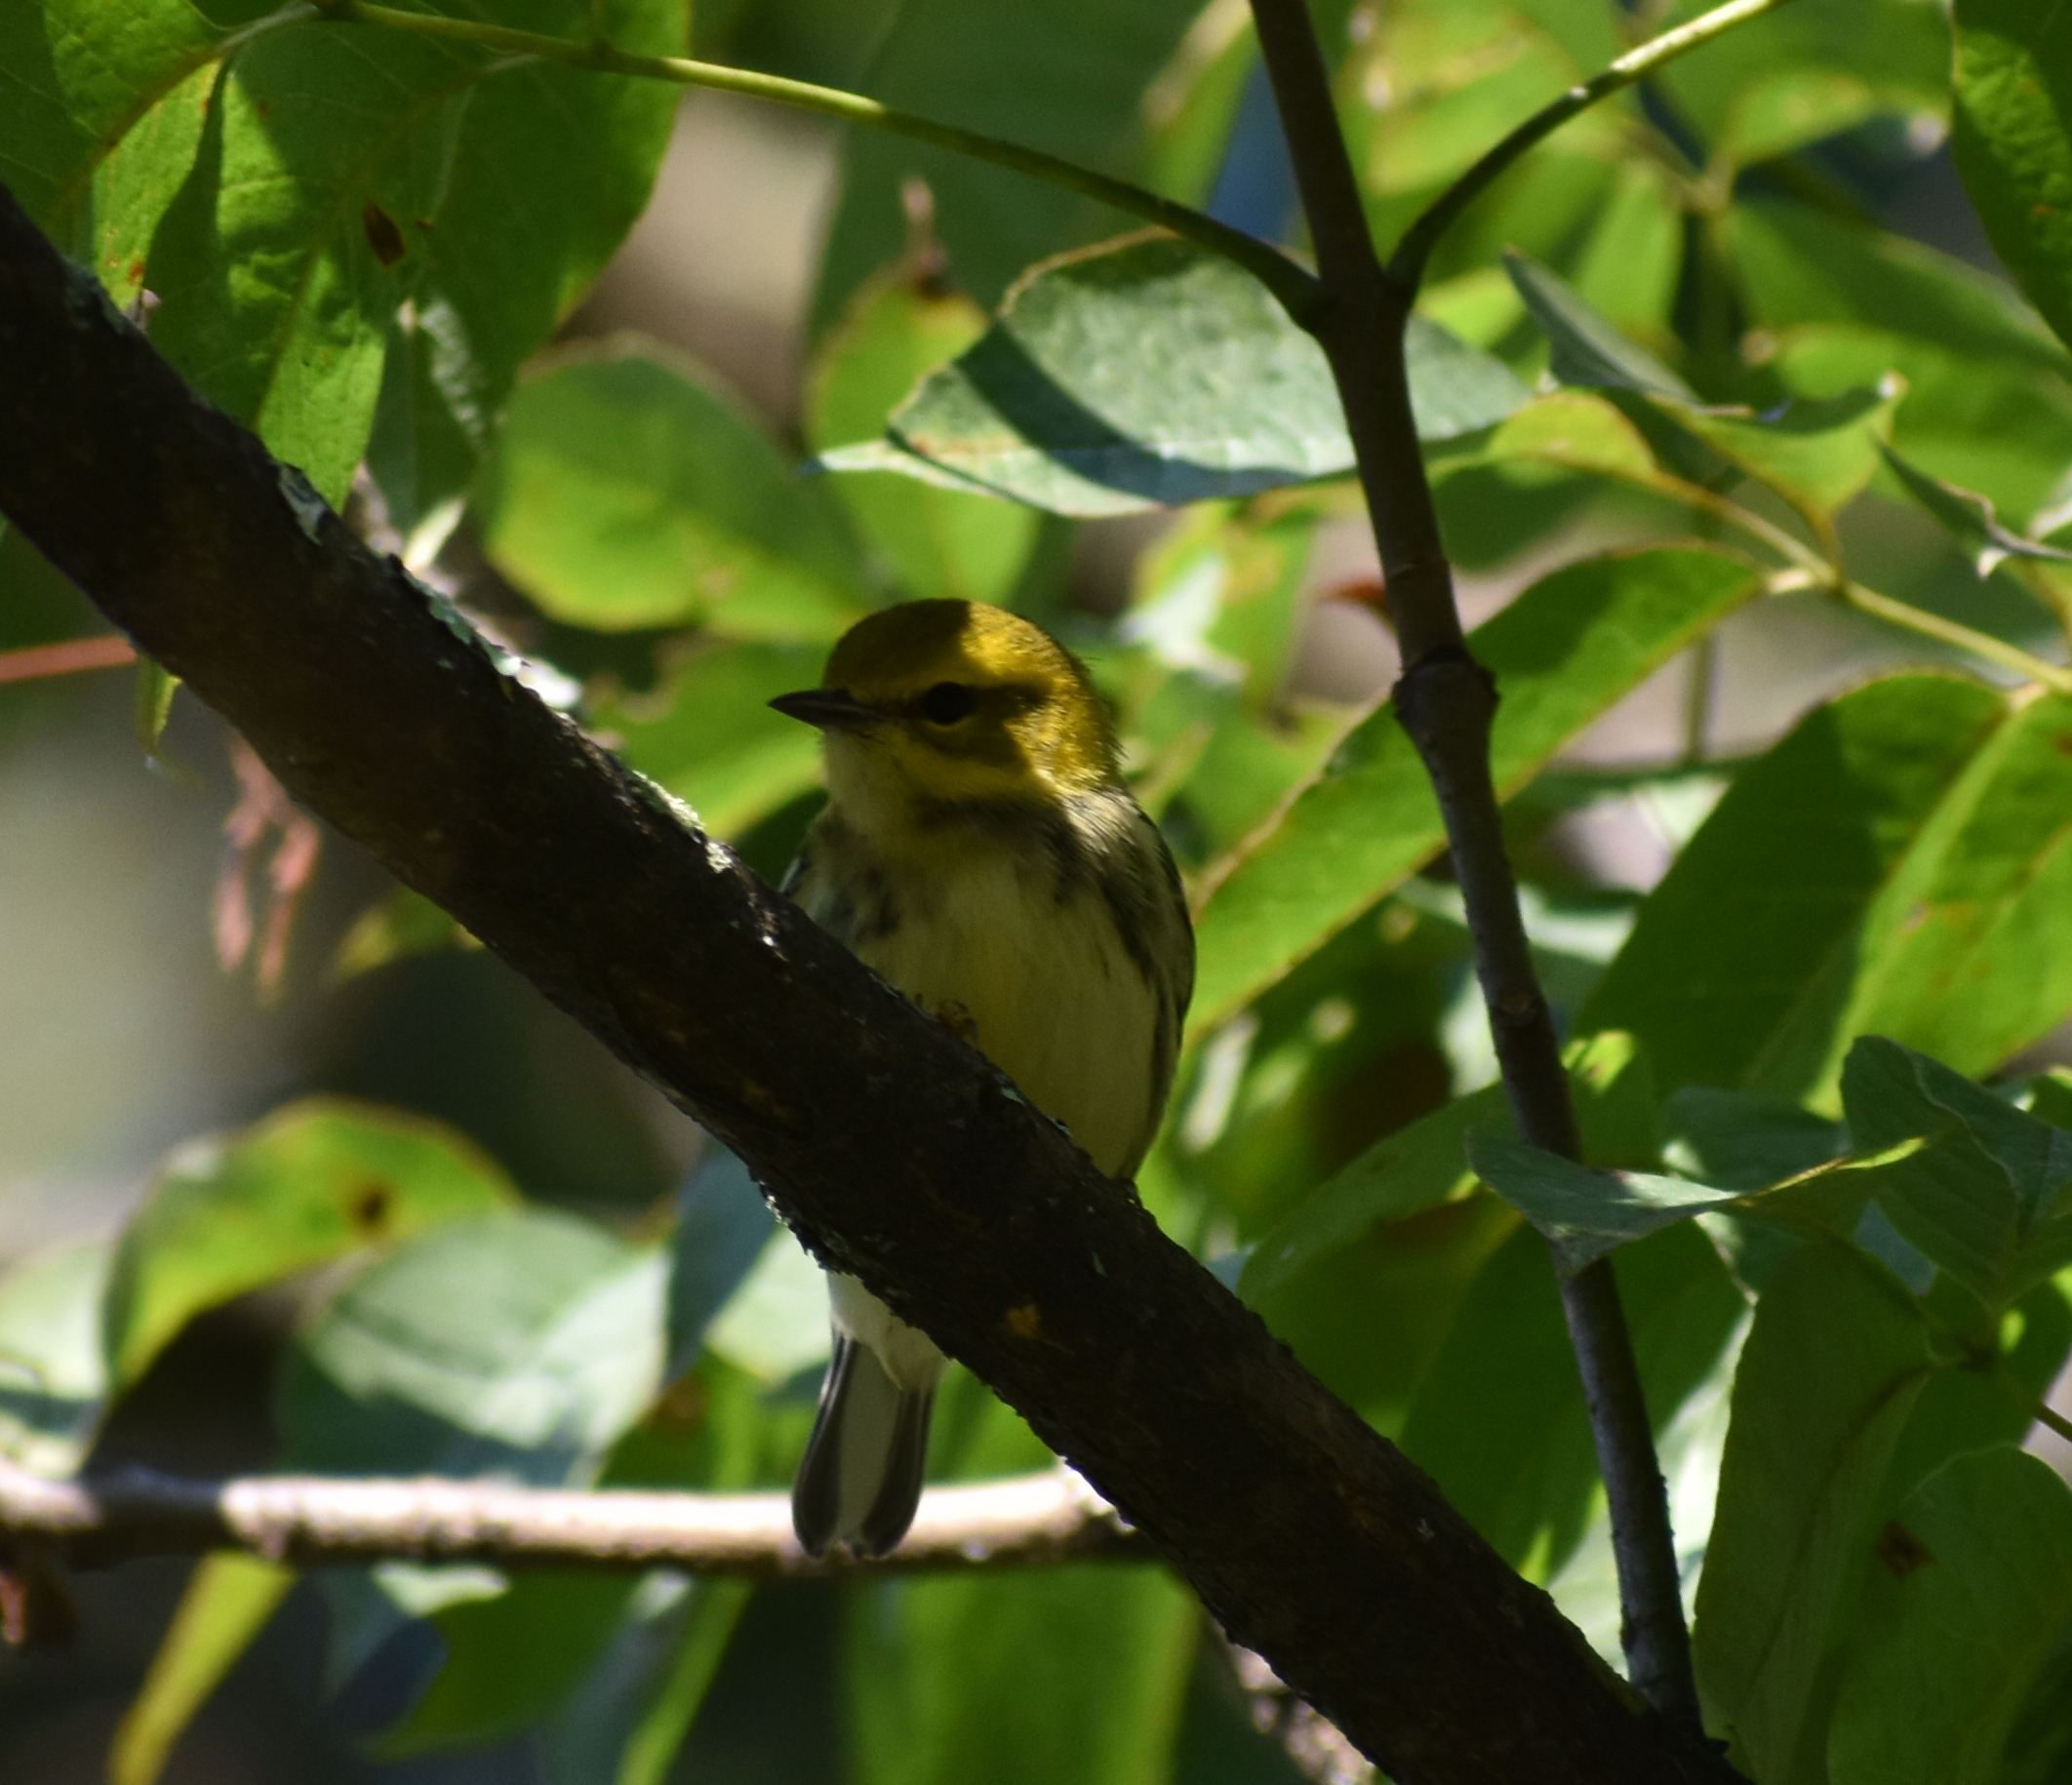 Black-Throated Green Warbler in Ash